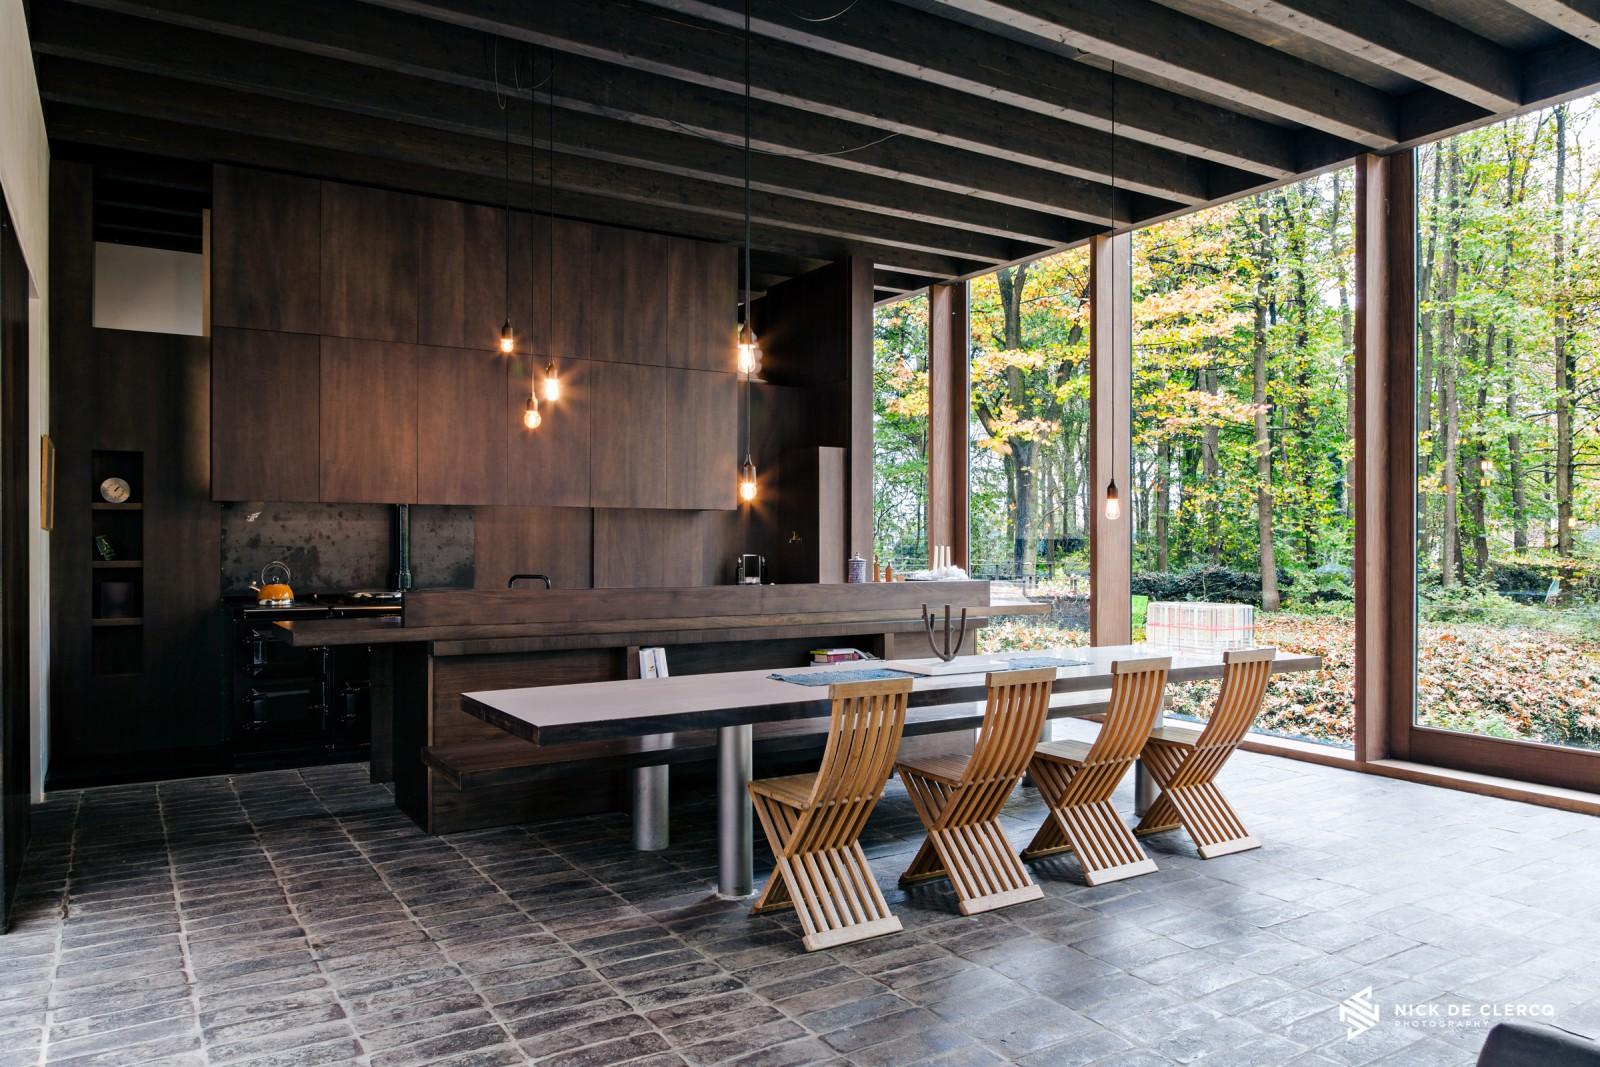 Wabi Sabi Architecture Nick De Clercq Photography